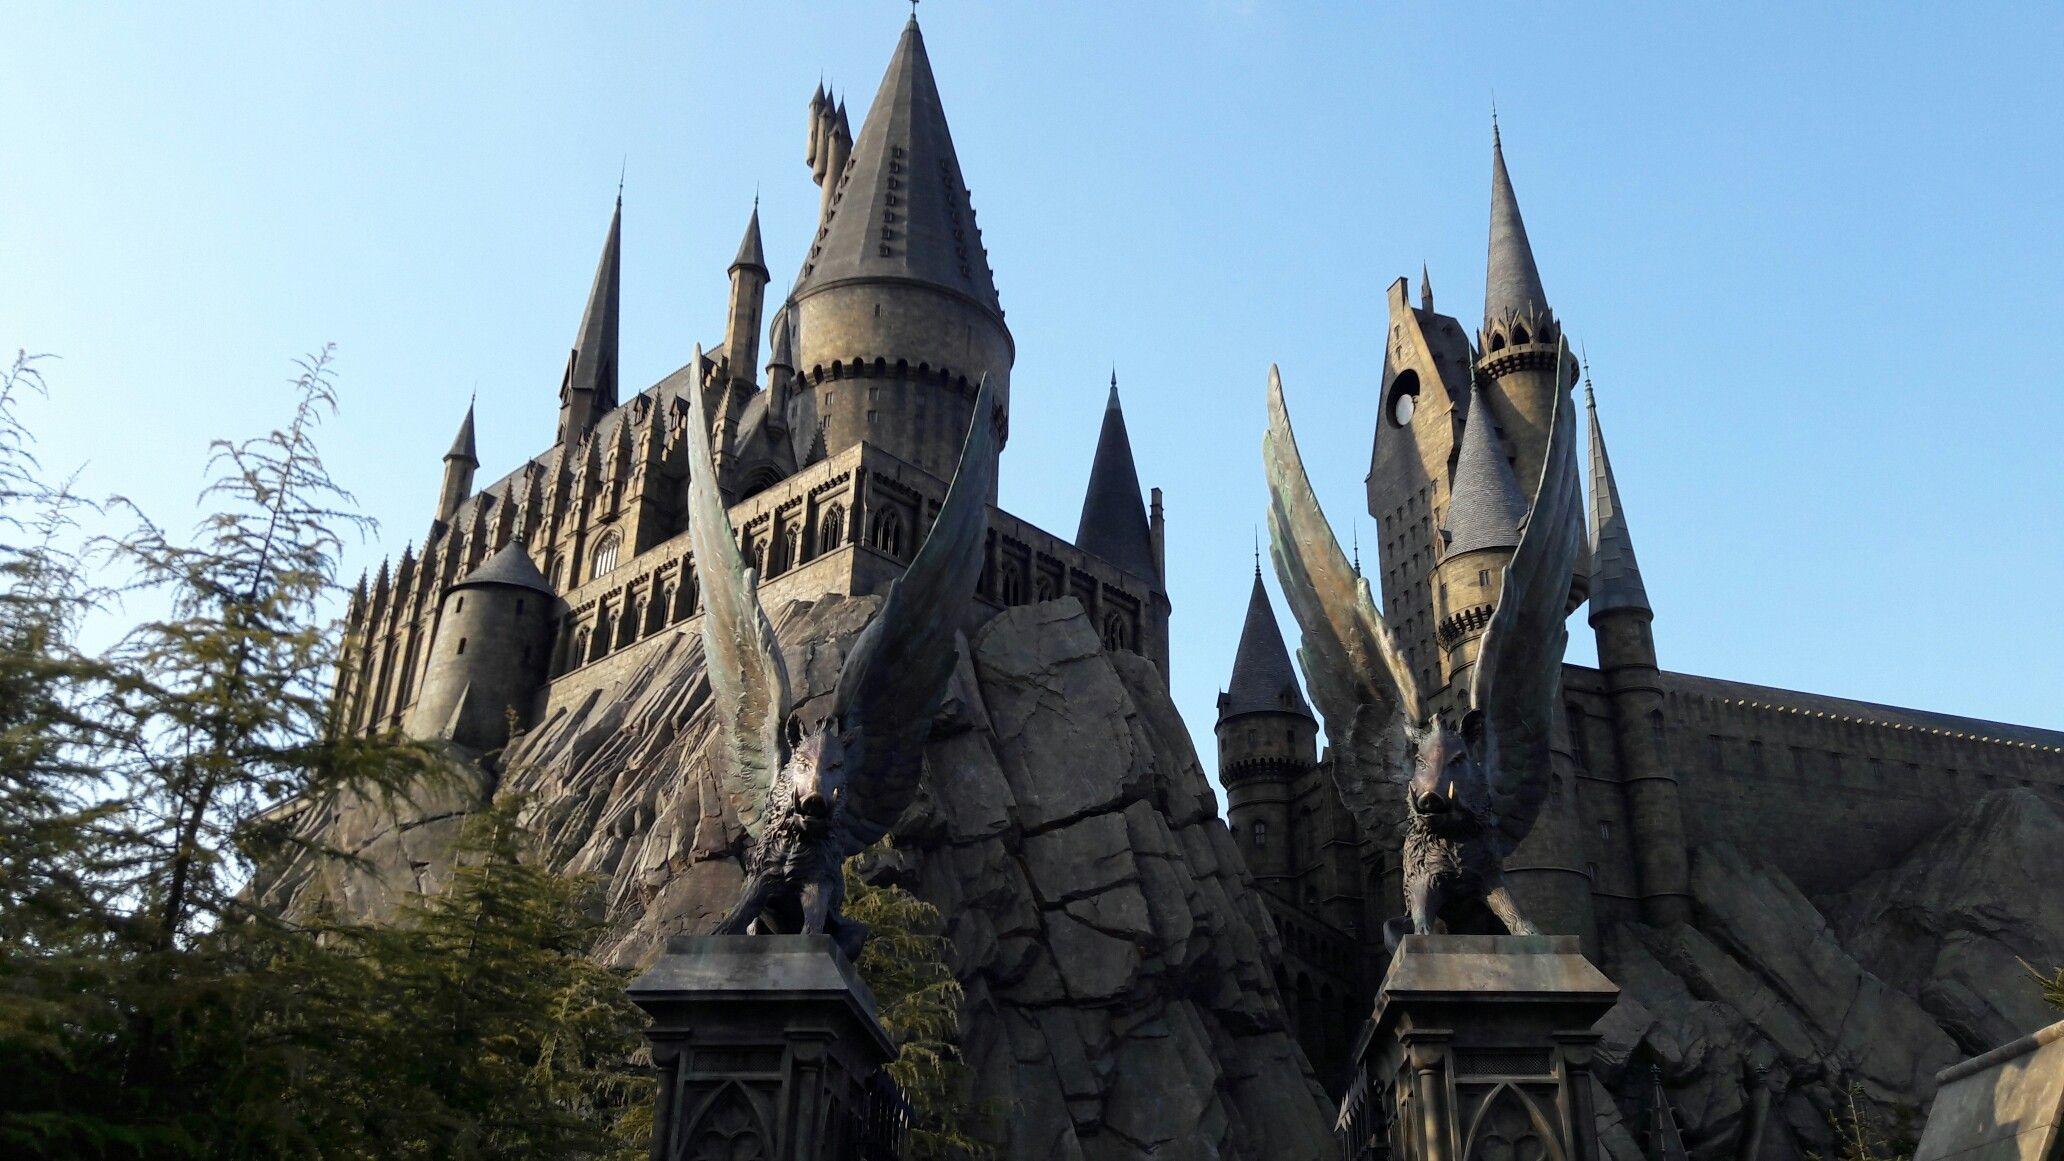 The Wizarding World of Harry Potter, USJ Osaka